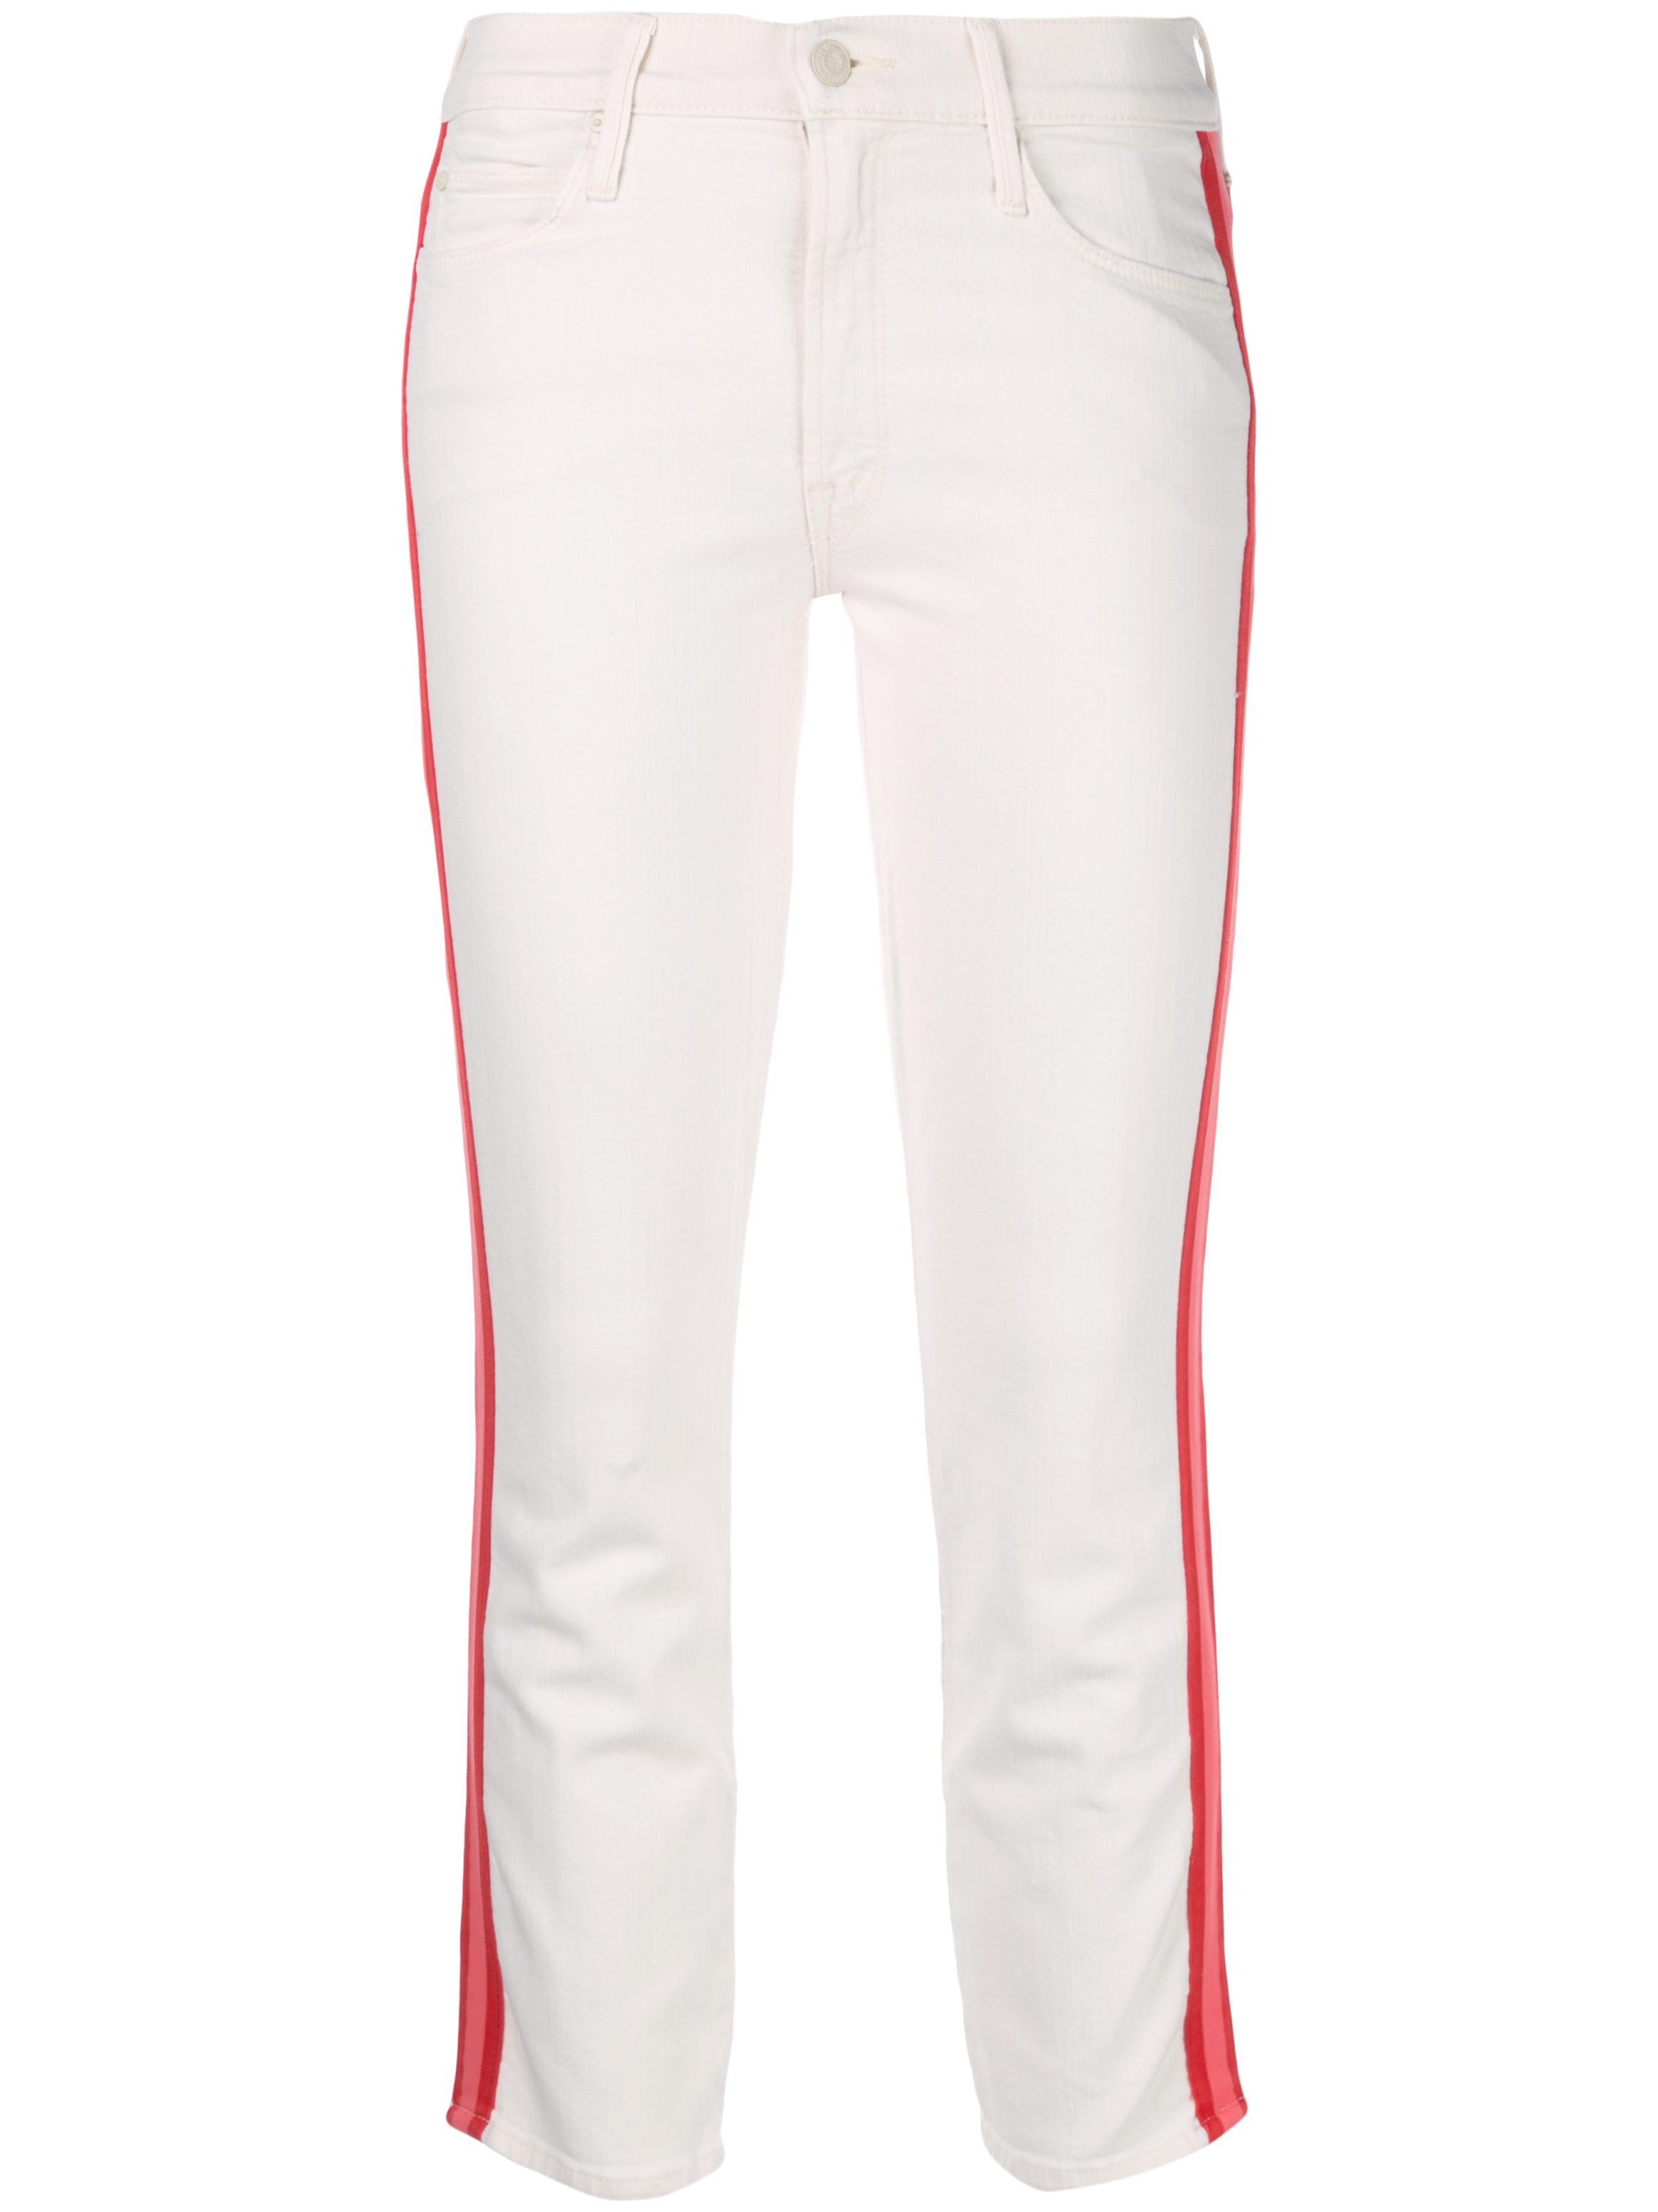 Mid Rise Dazzler Crop Pink Racer Stripe Item # 1816-381-WPR